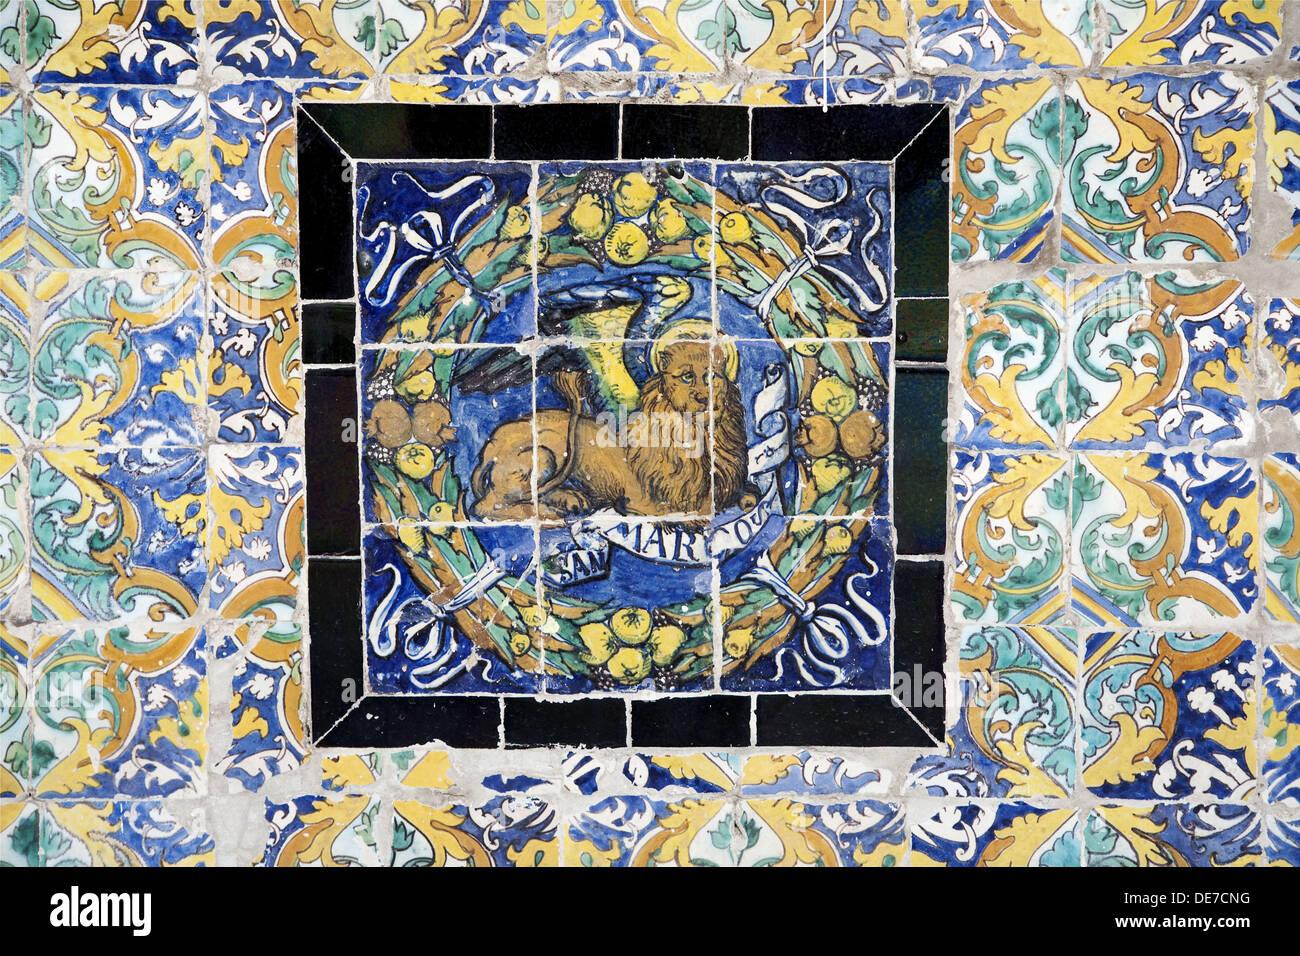 Saint mark symbol on old glazed ceramic tiles fine arts museum saint mark symbol on old glazed ceramic tiles fine arts museum seville spain dailygadgetfo Gallery